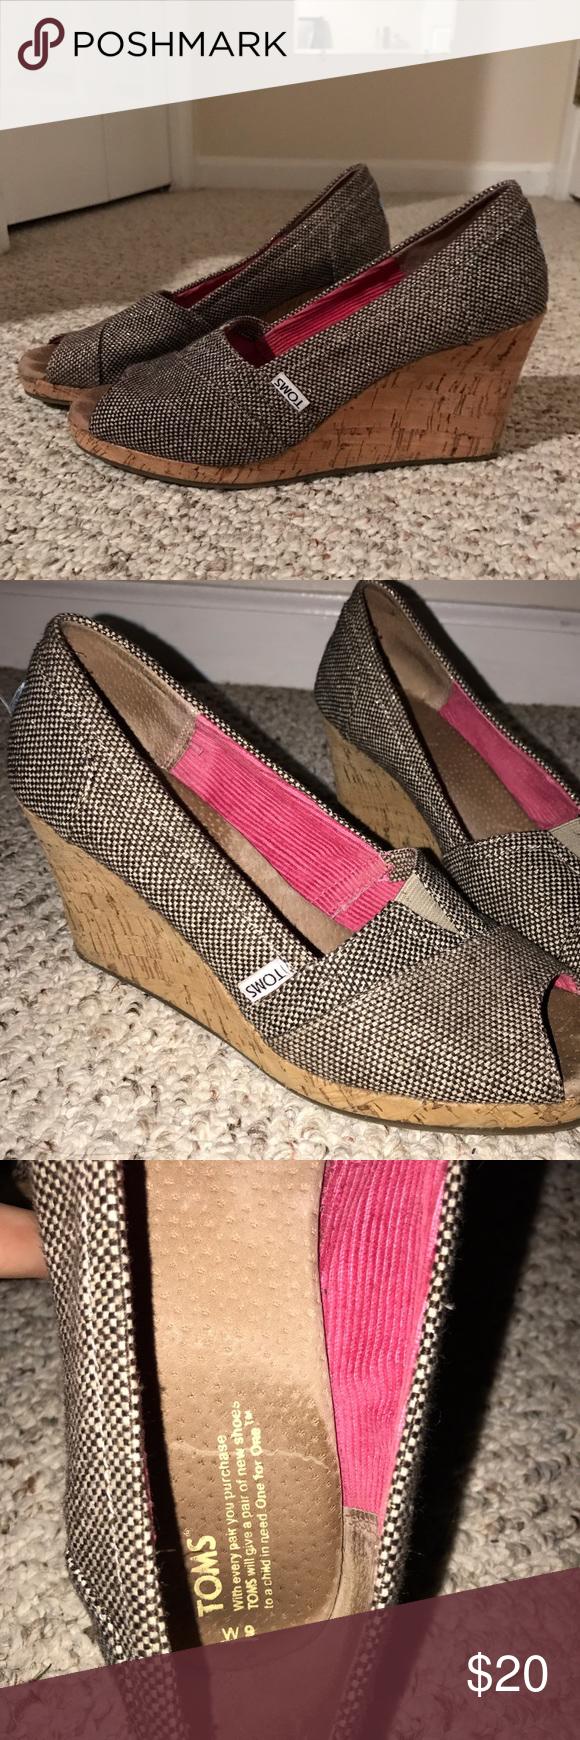 Tom's Calypso Women's Size 9 Peep toe wedge heels Tom's Calypso Women's Size 9. Brown beige tweed fabric canvas uppergold color metallic thread accents. Peep toe slip on shoes 3. 5